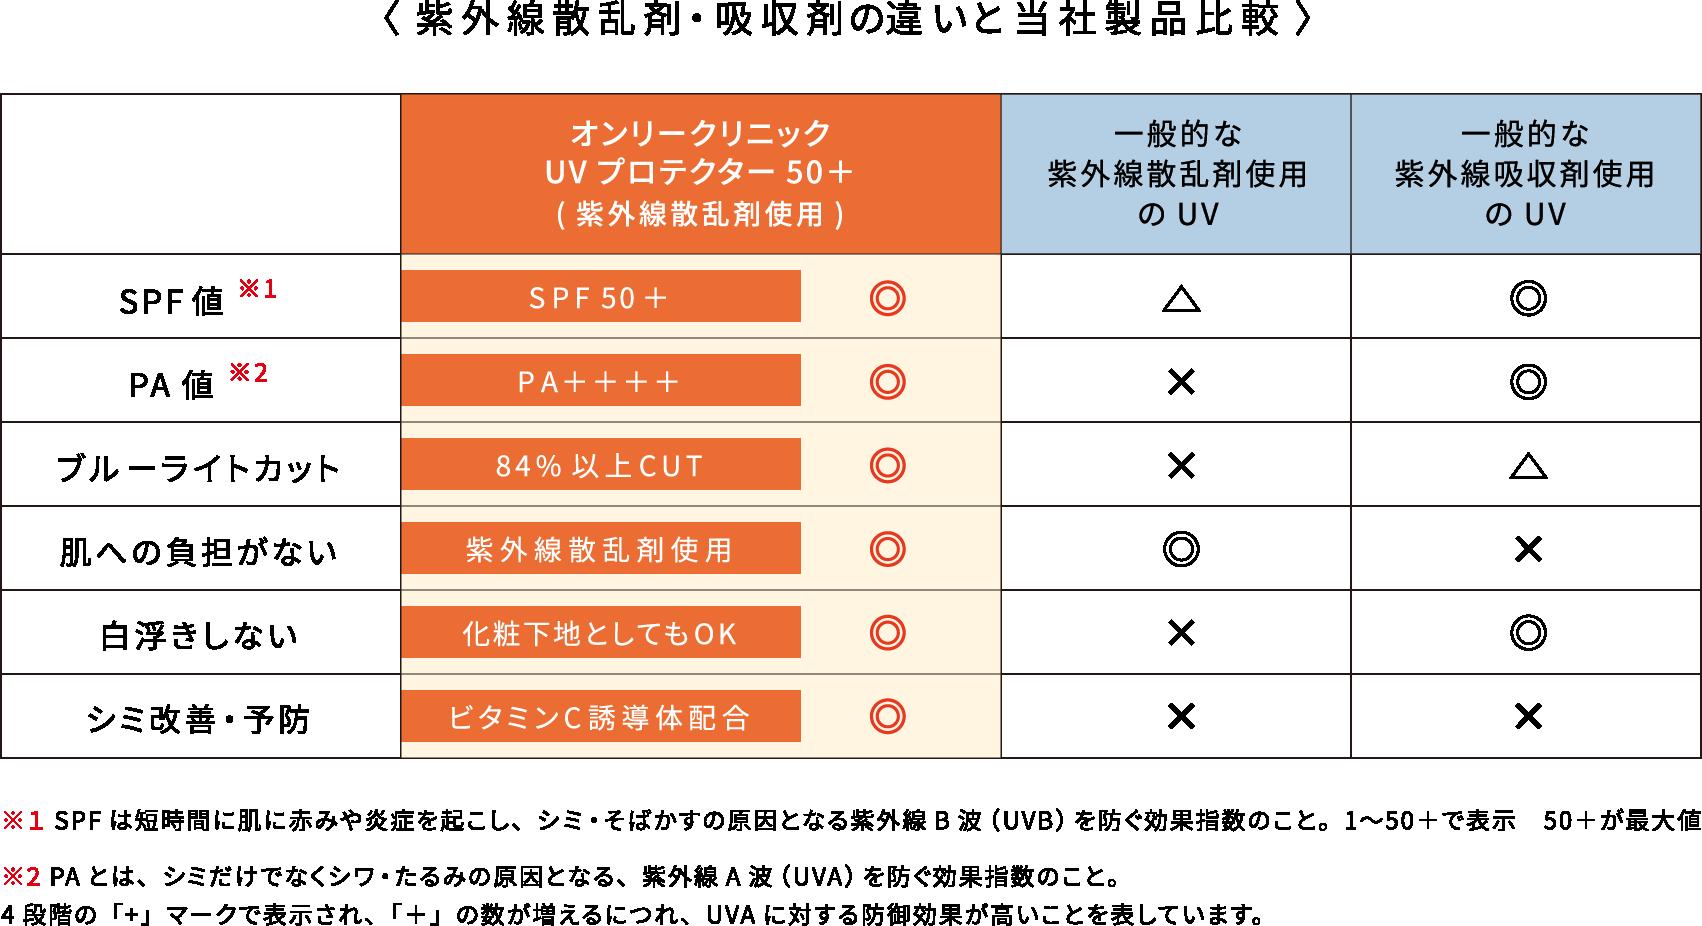 紫外線散乱剤・吸収剤の違いと当社製品比較